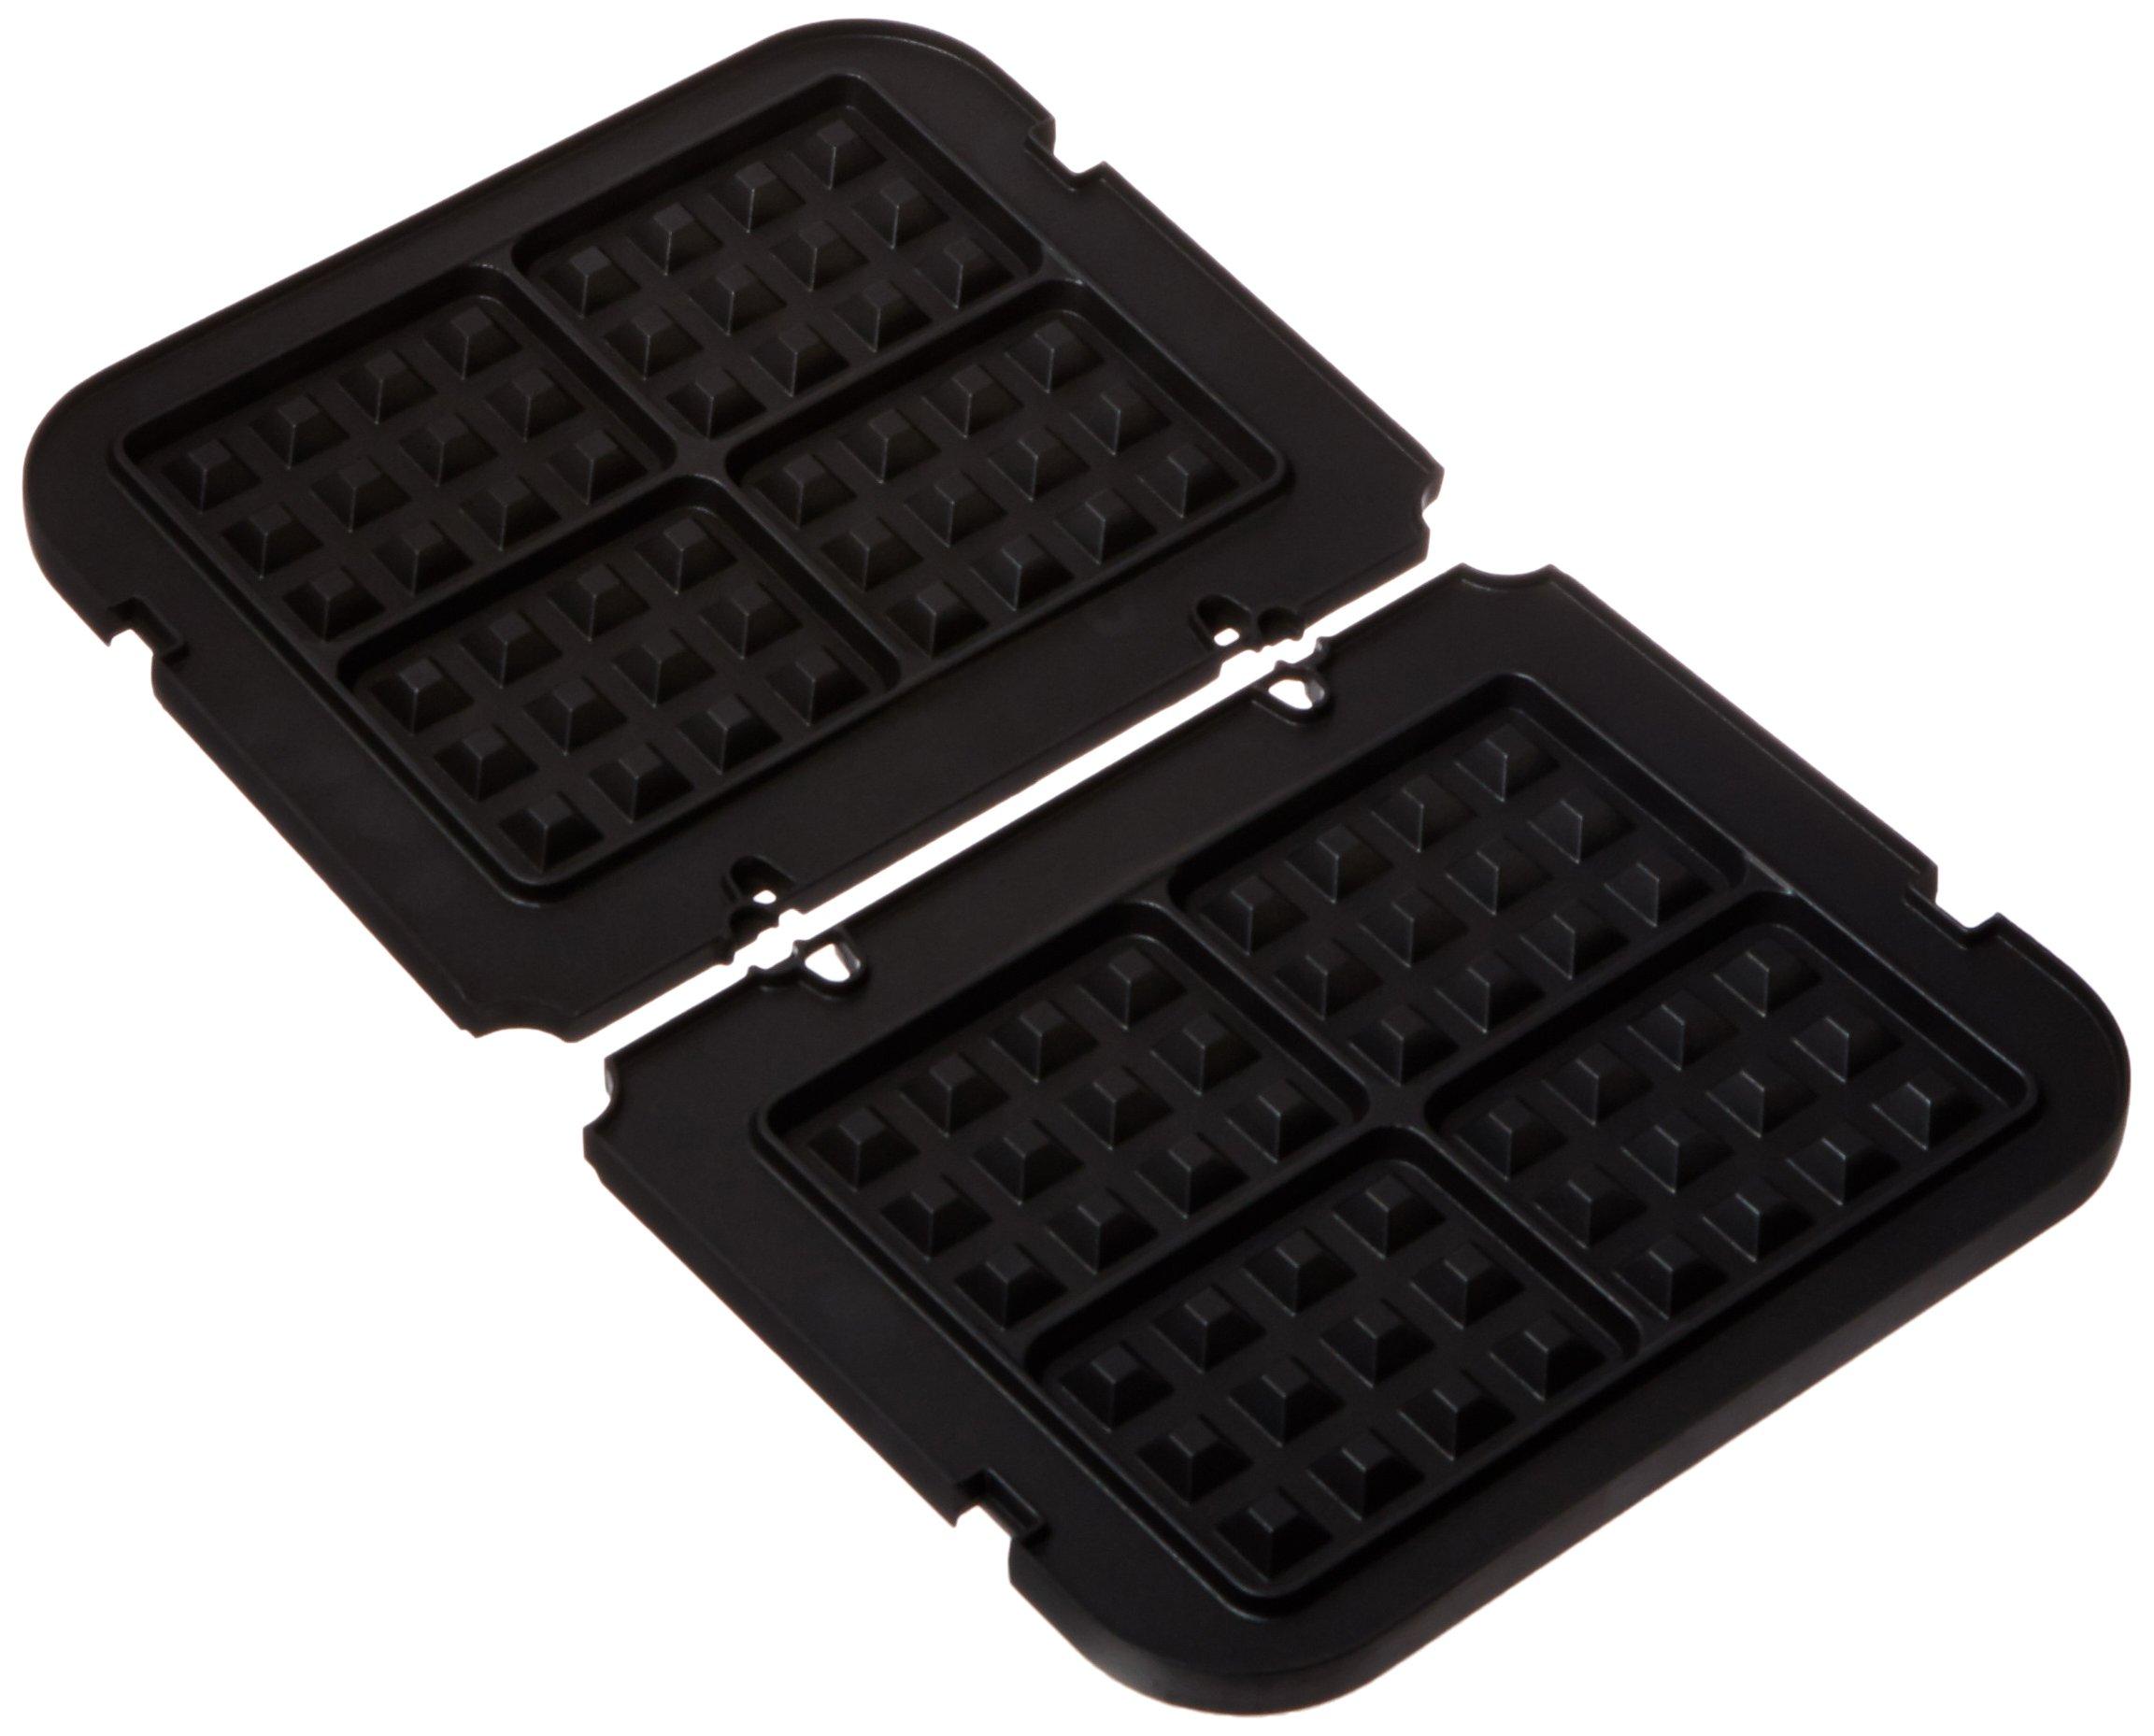 Cuisinart GR-WAFP Griddler Waffle Plates (Plates only)